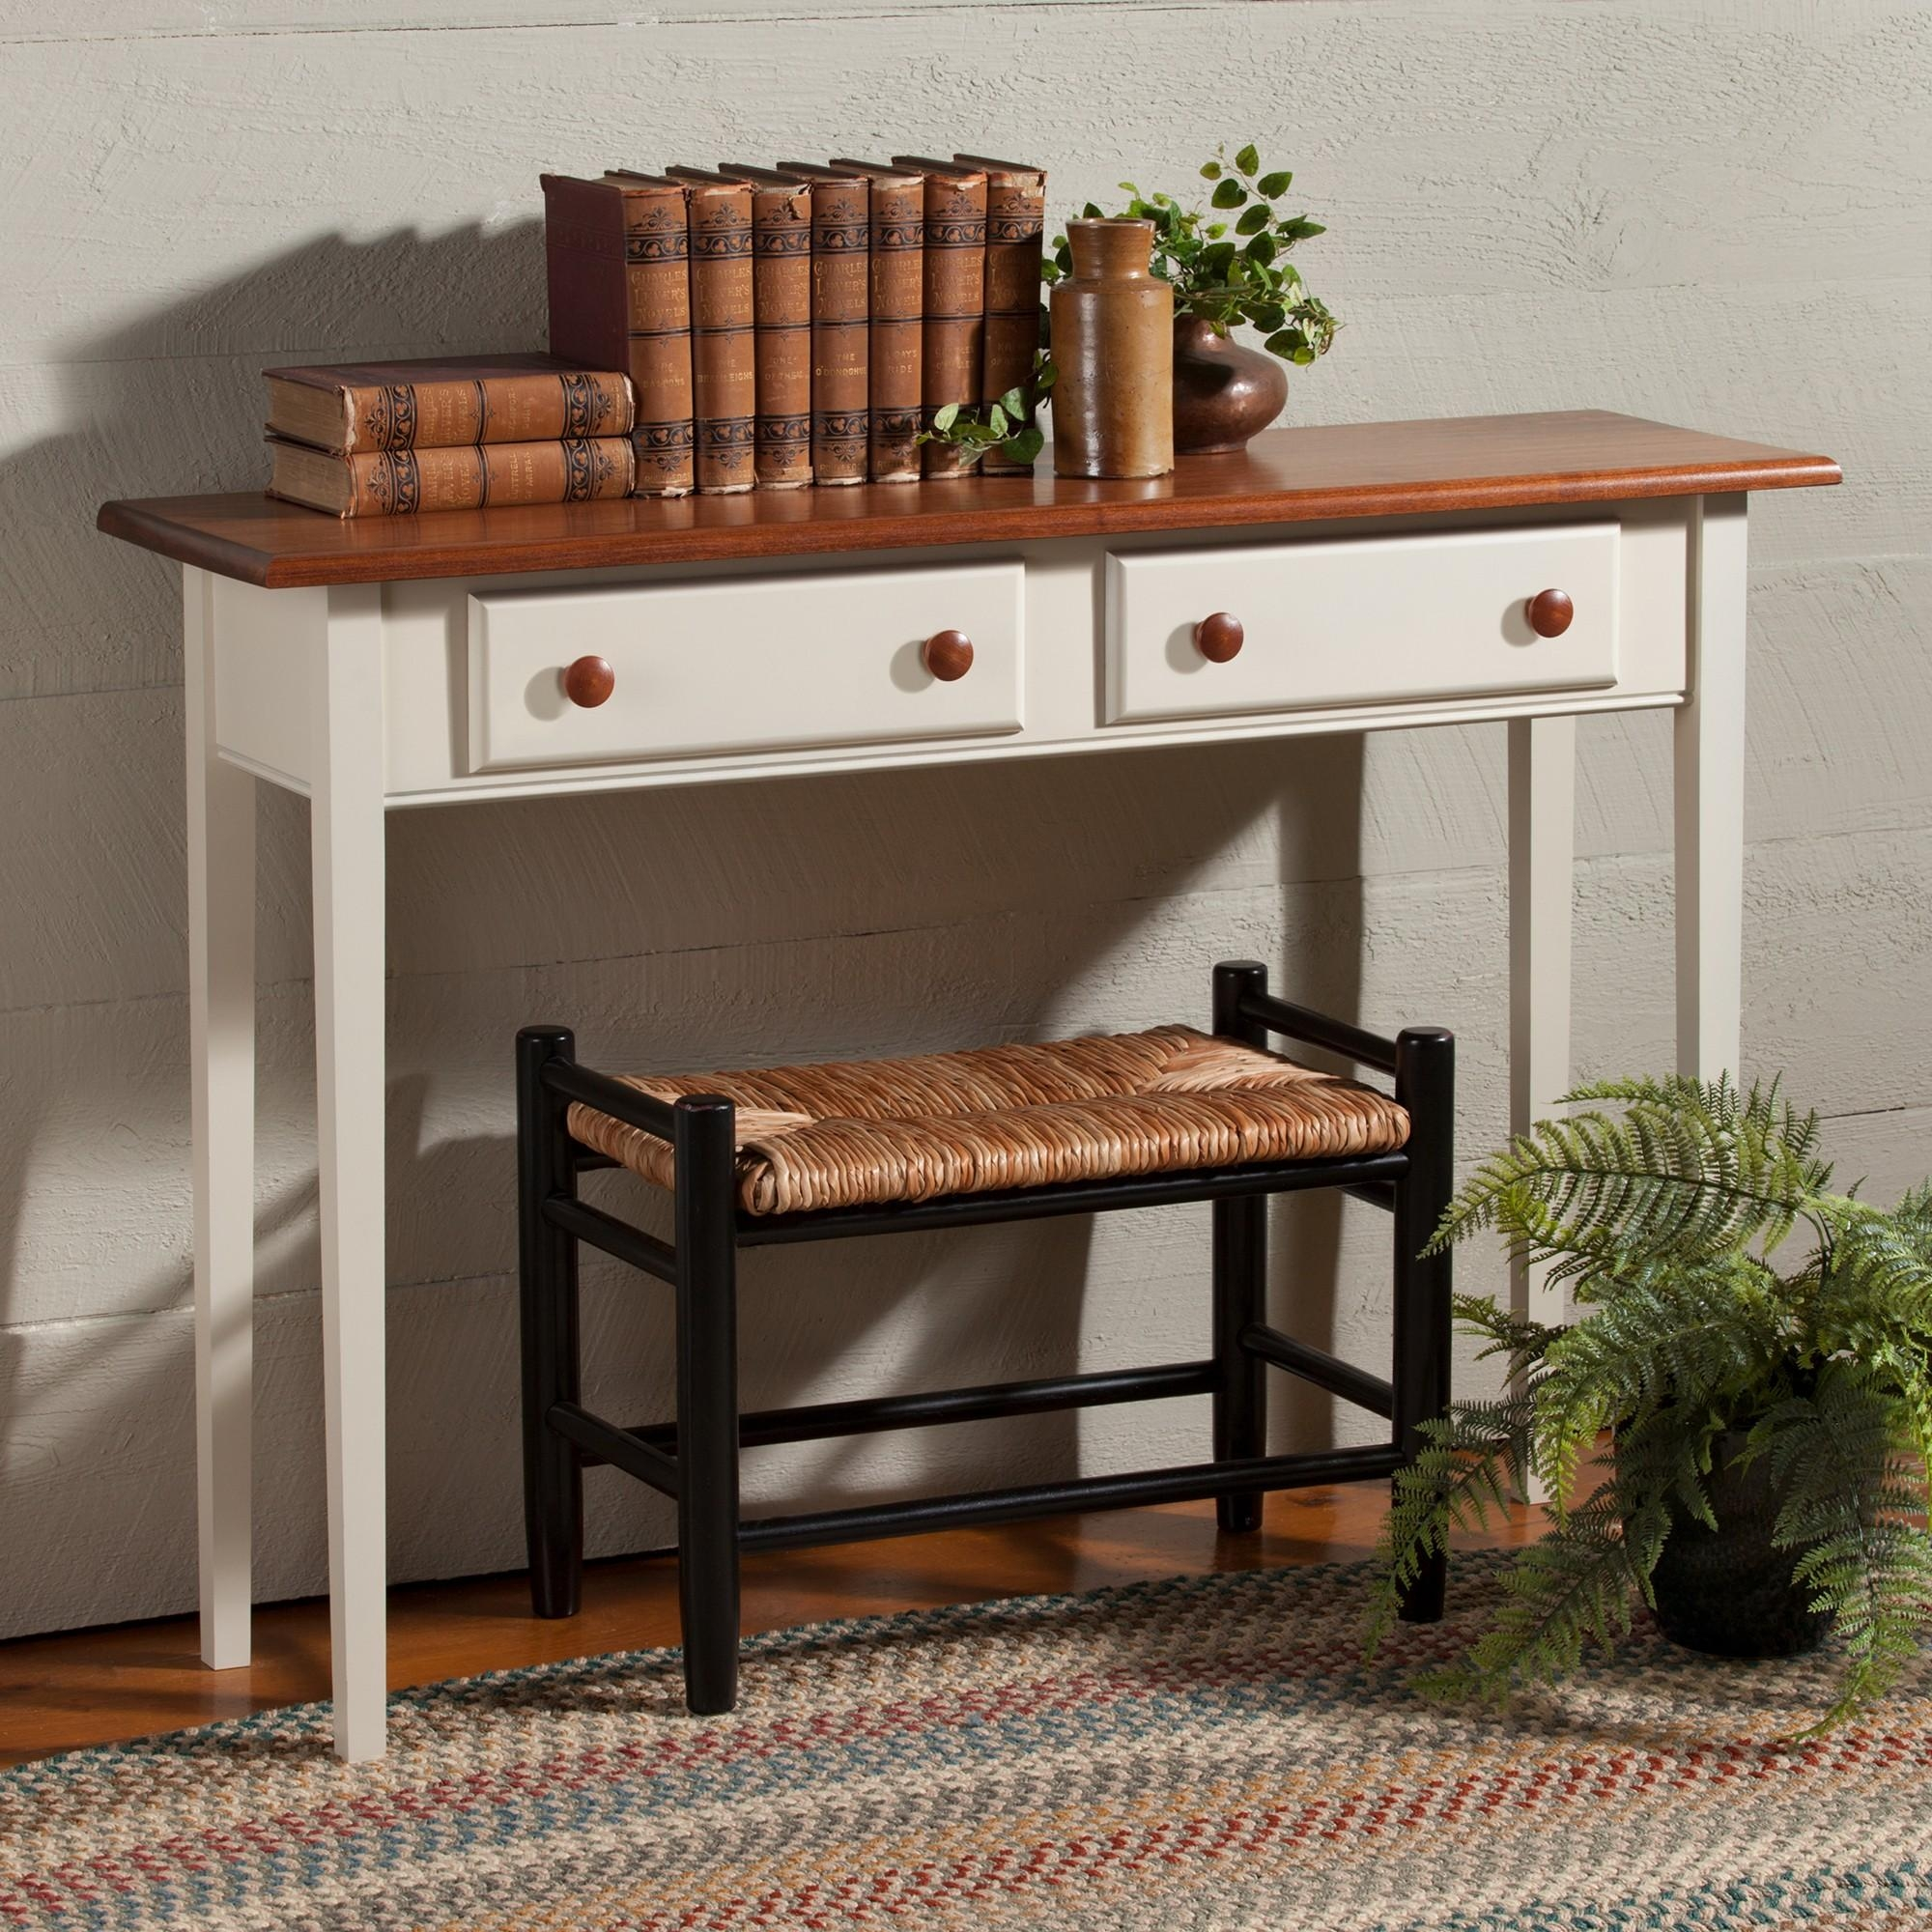 Country Shaker Sofa Hall Table | Sturbridge Yankee Workshop Throughout Shaker Sofas (Image 5 of 20)